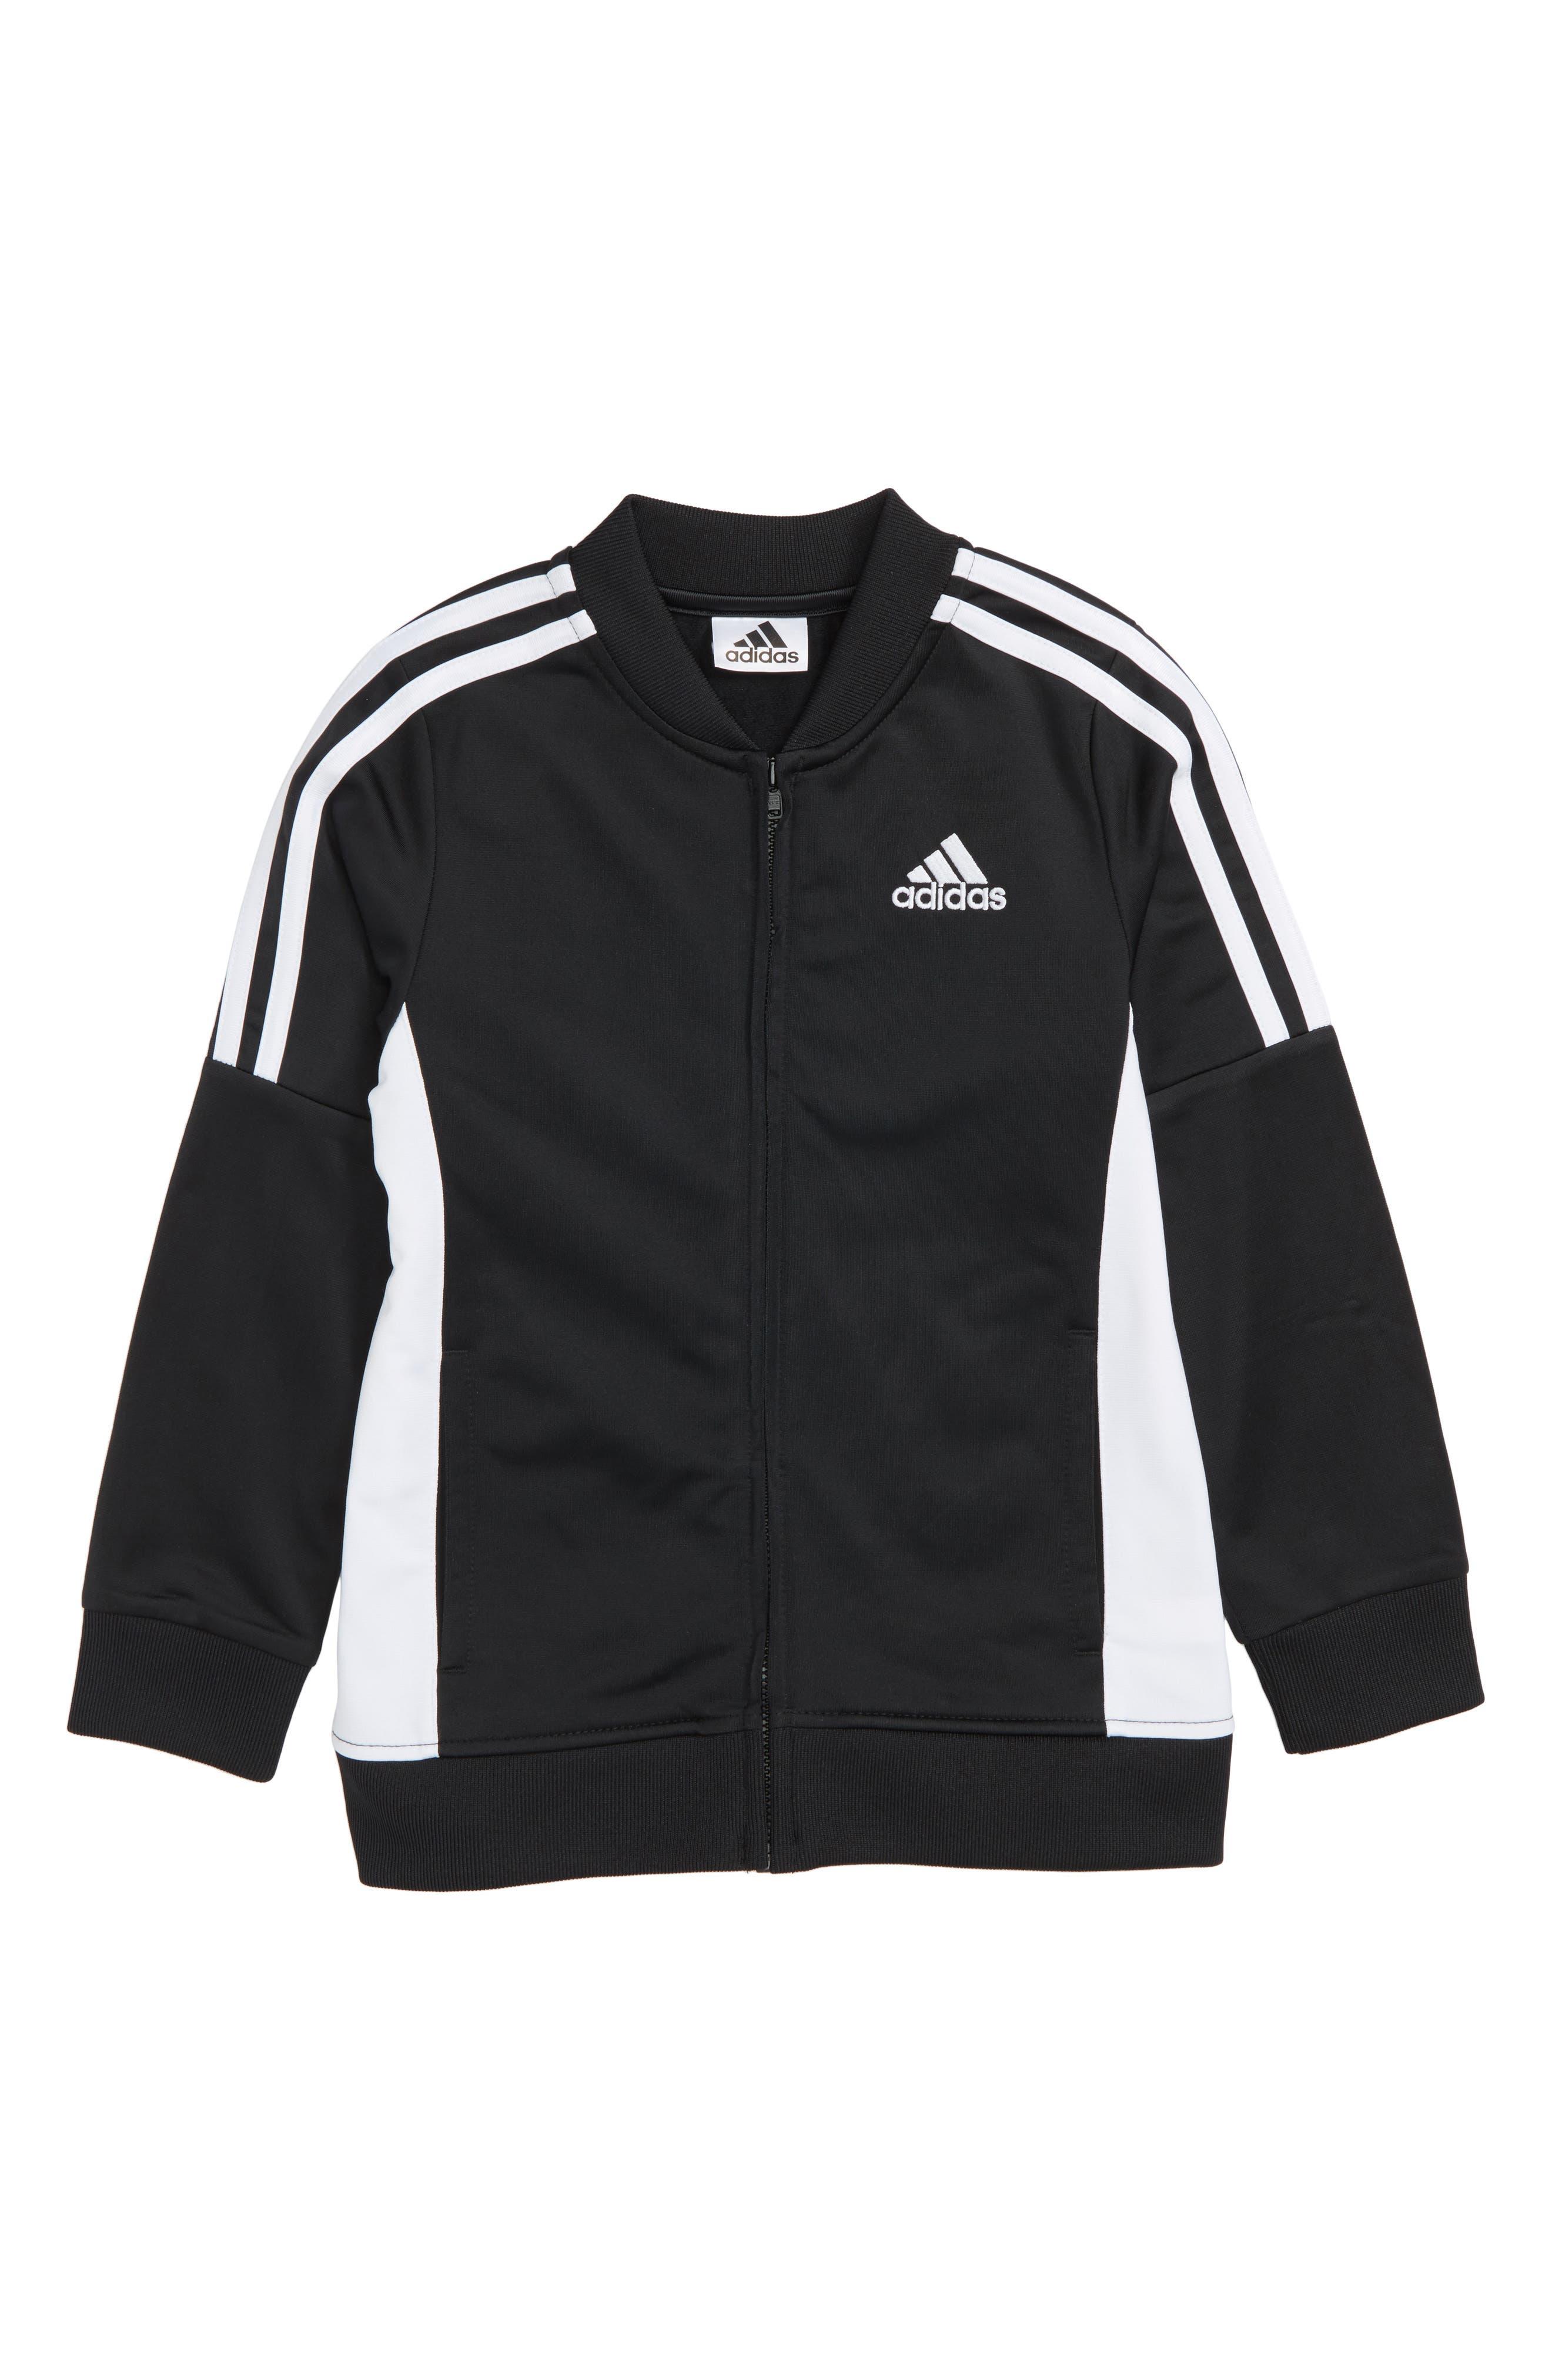 adidas Tricot Track Jacket (Toddler Boys \u0026 Little Boys)